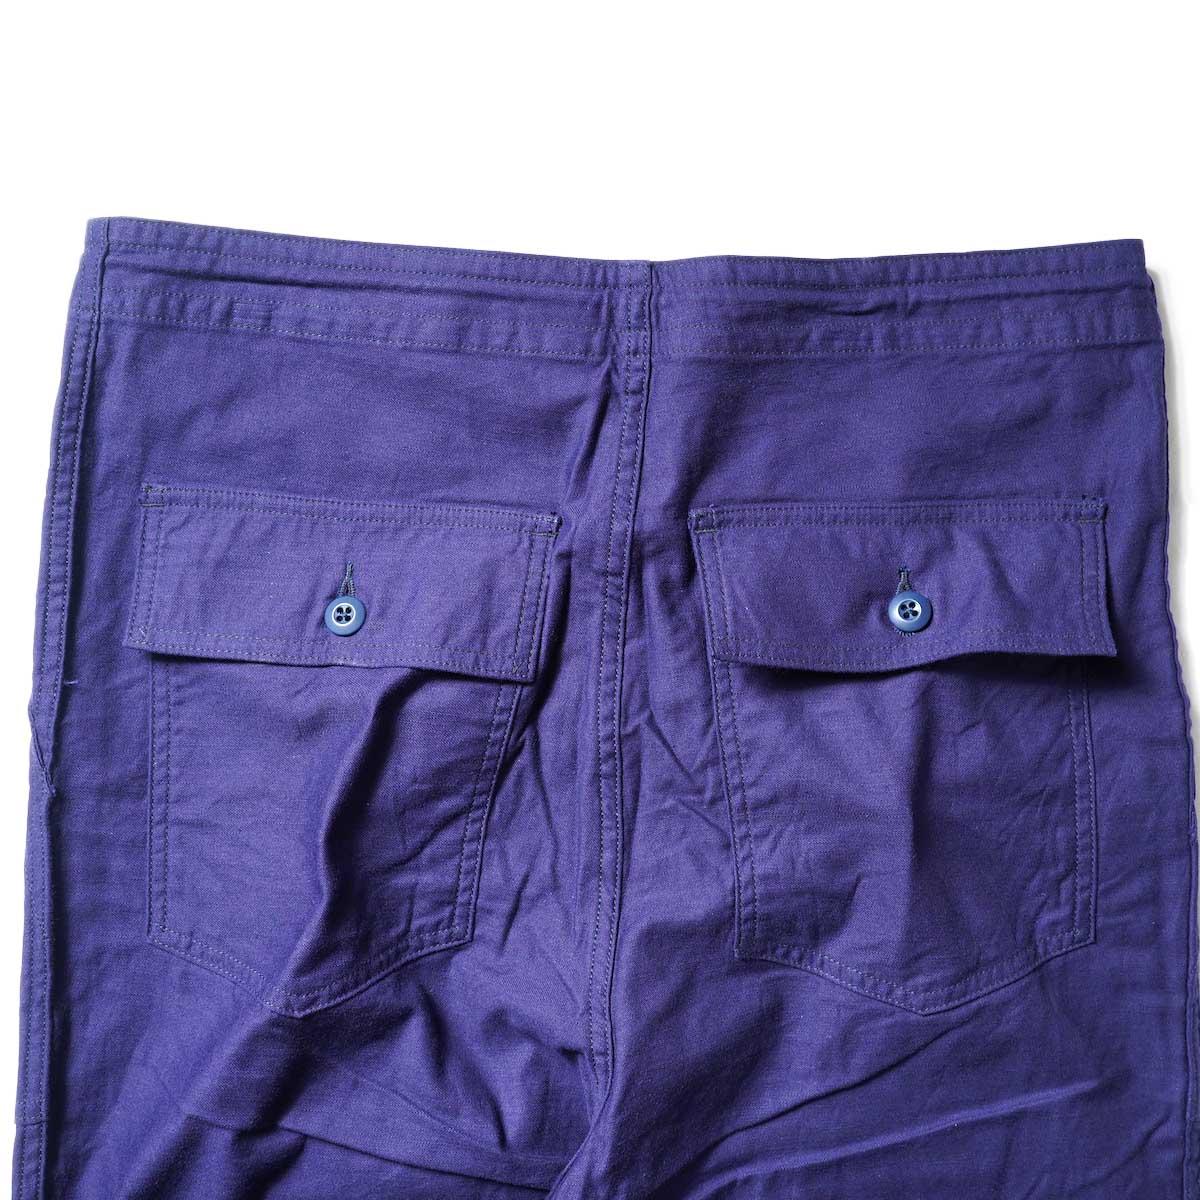 Needles / STRING FATIGUE PANT - BACK SATEEN (Navy)ヒップポケット